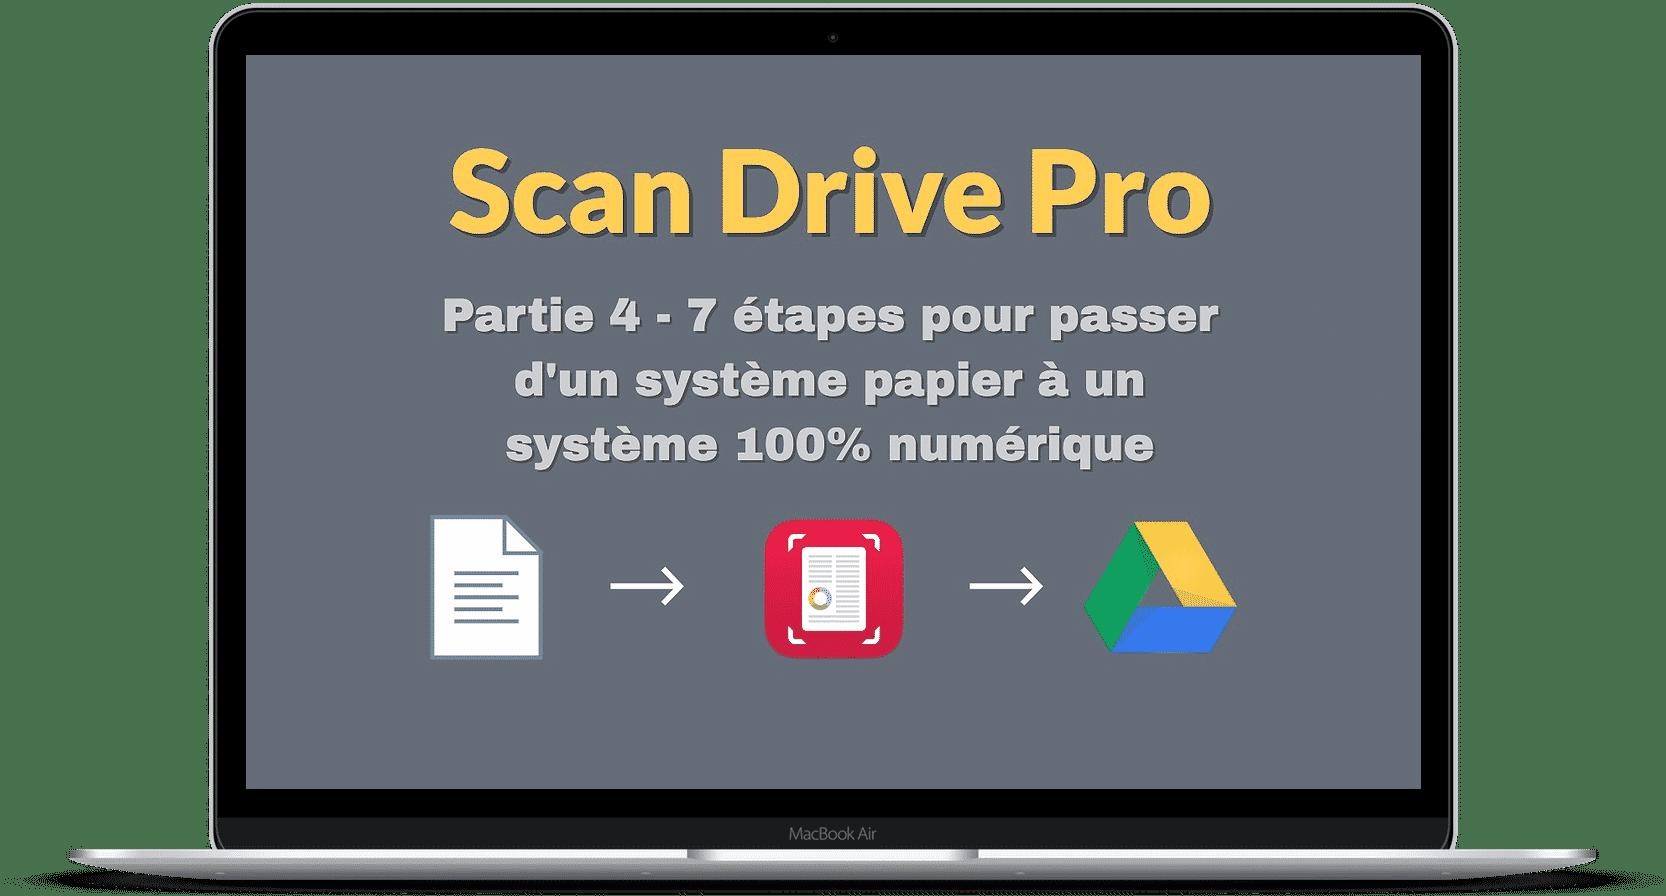 Scan Drive Pro 4